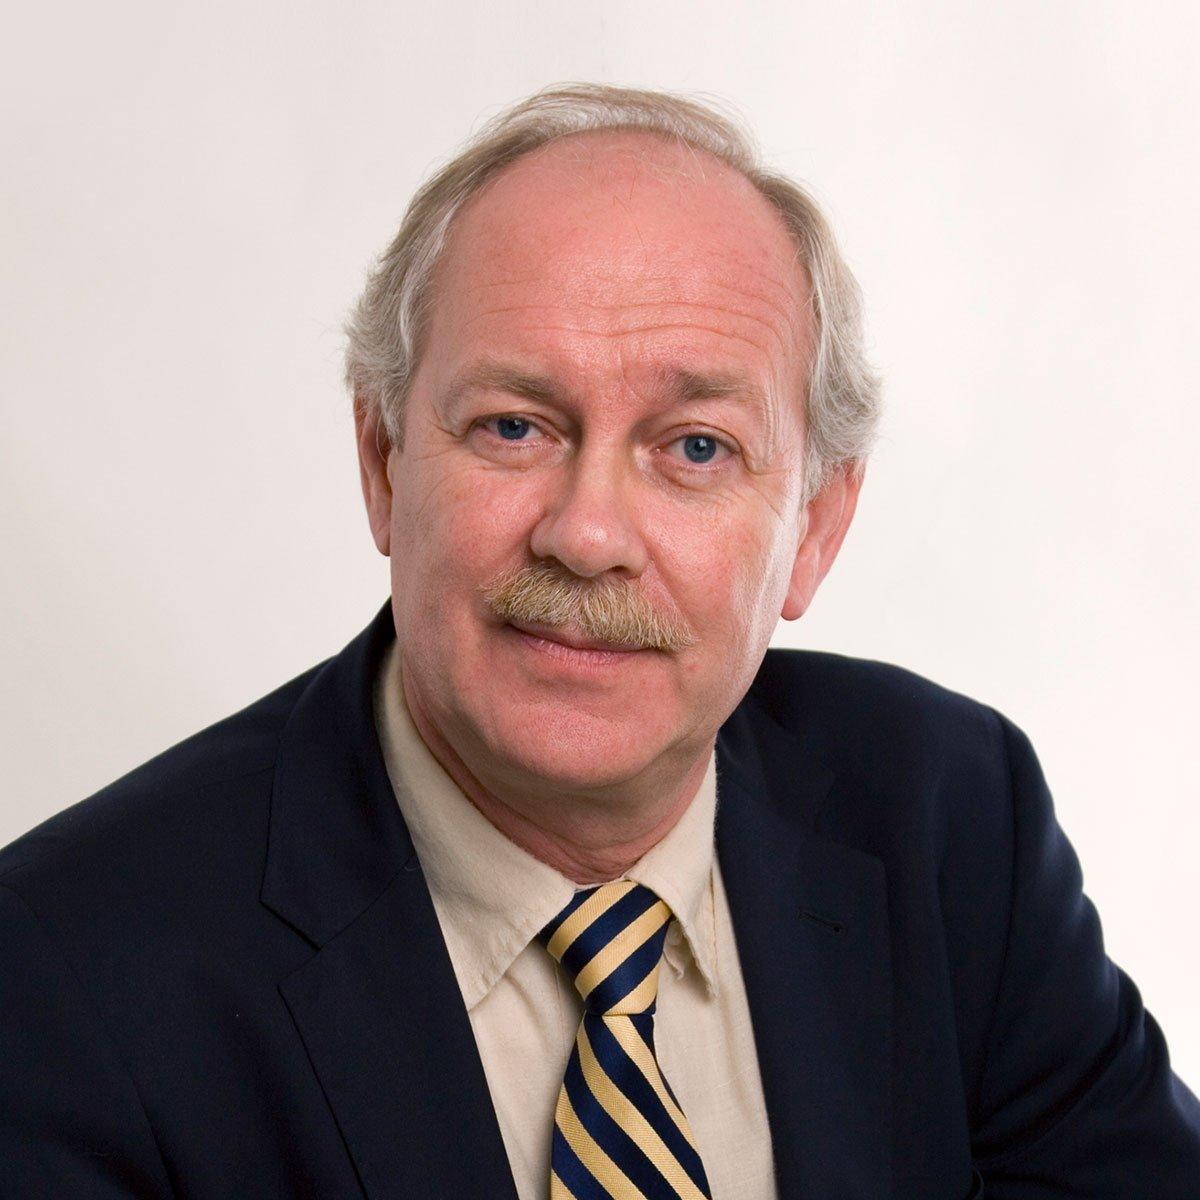 Dr. JG Bakker